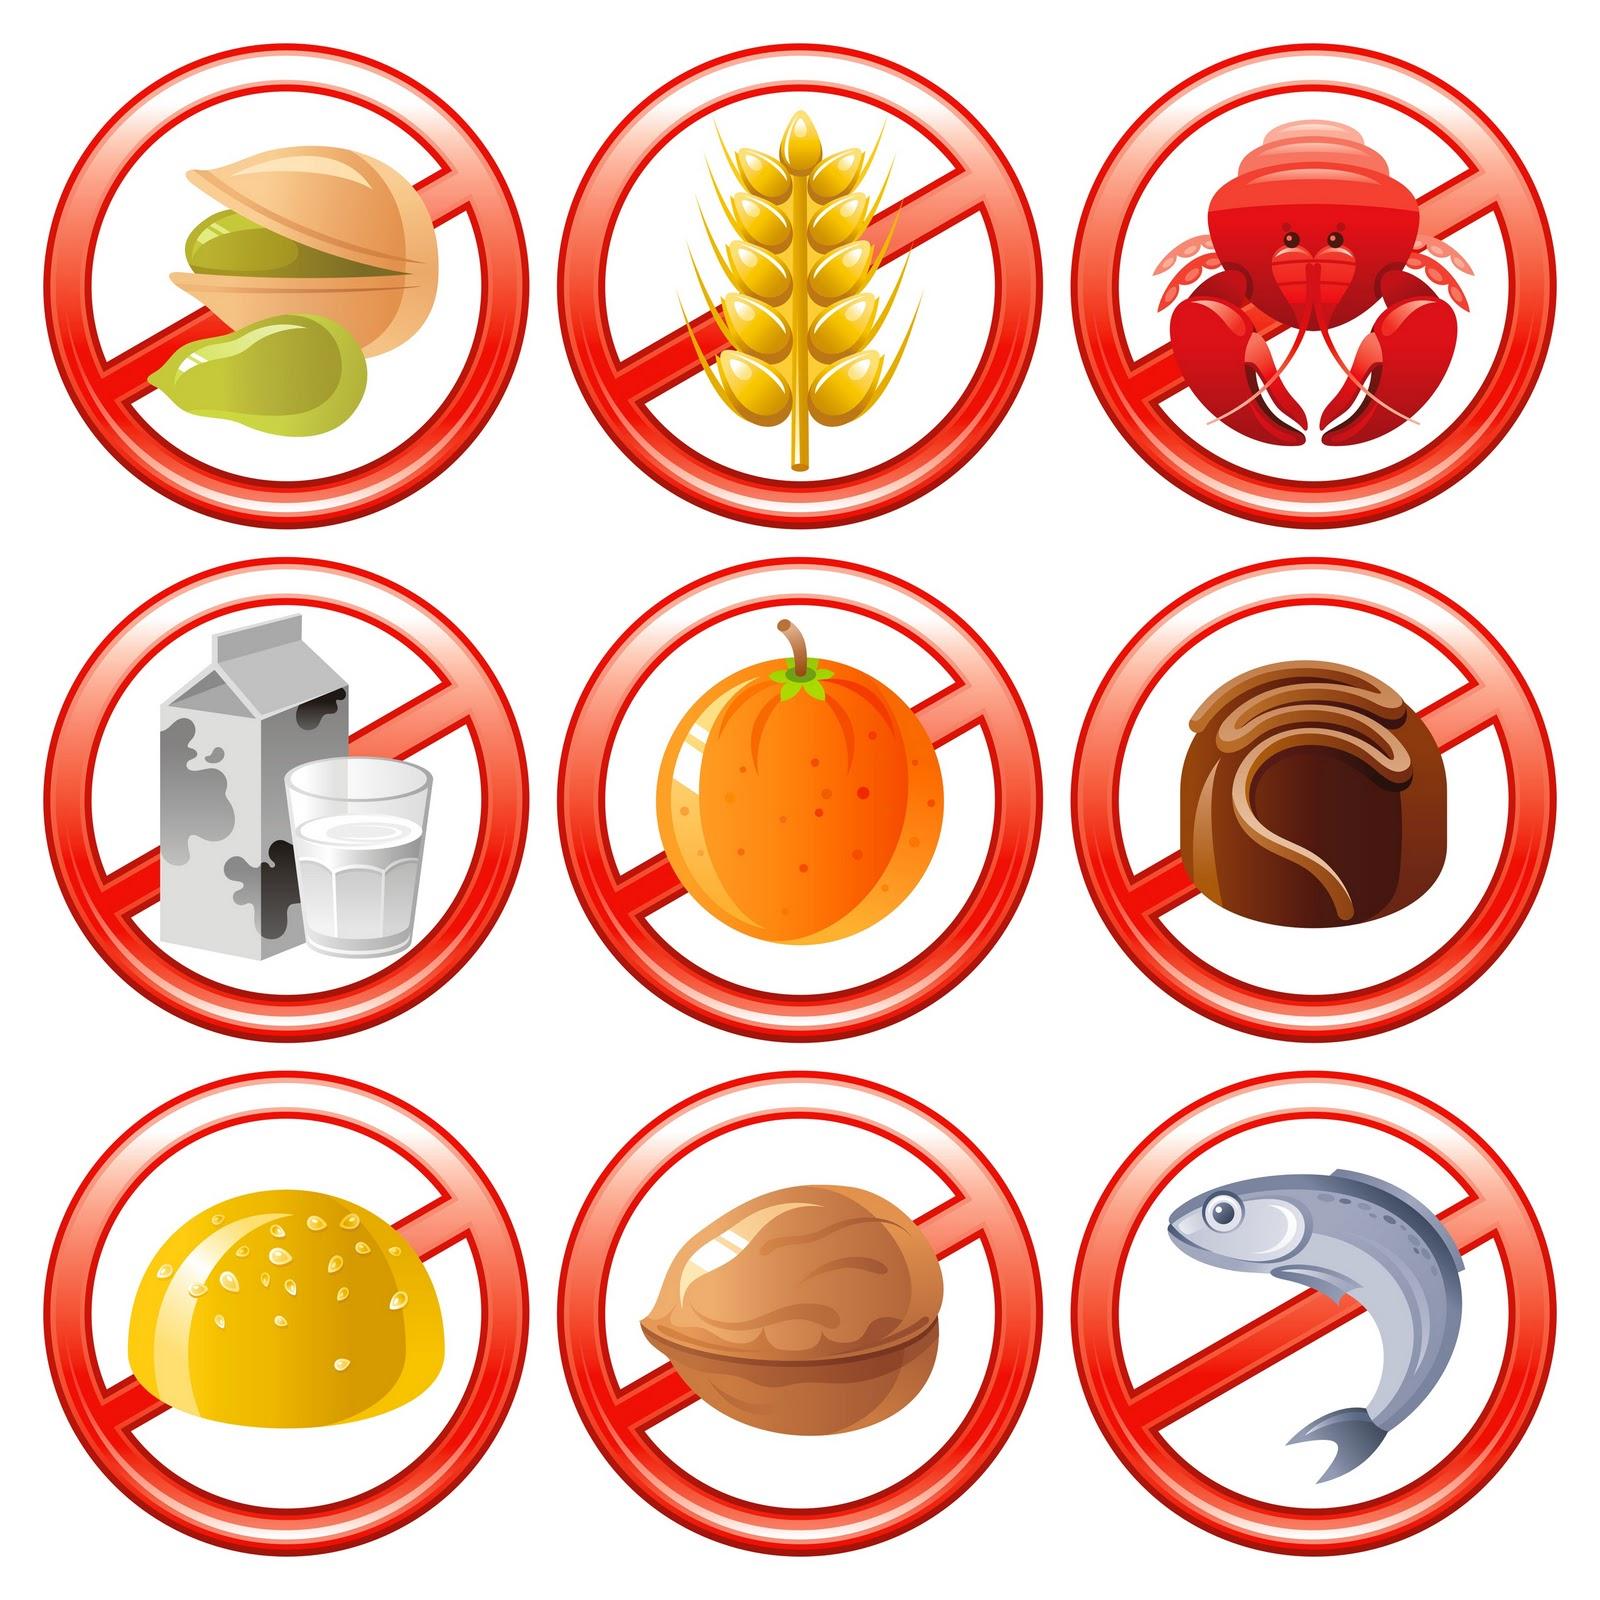 آلرژي غذايي : allergy food حساسیت غذایی